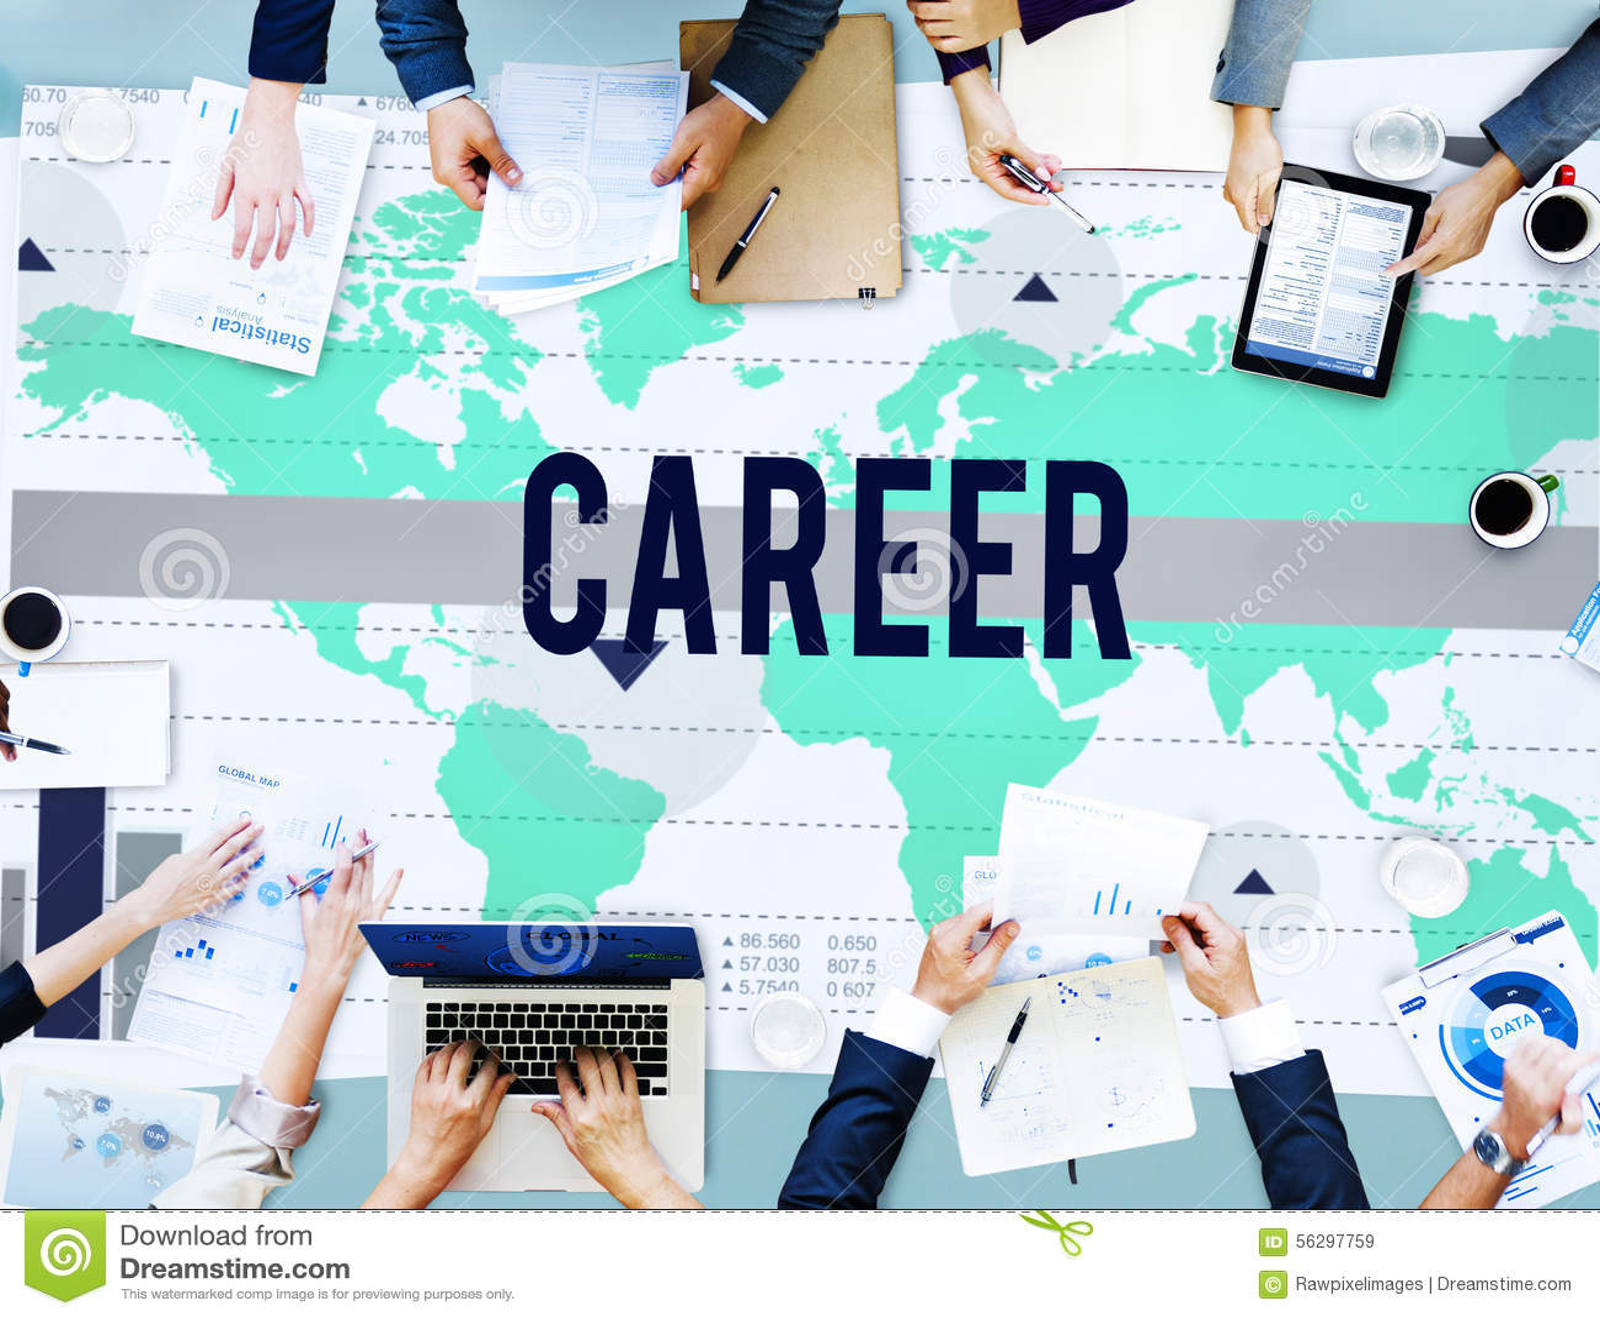 career job occupation business marketing concept stock photo career job occupation business marketing concept